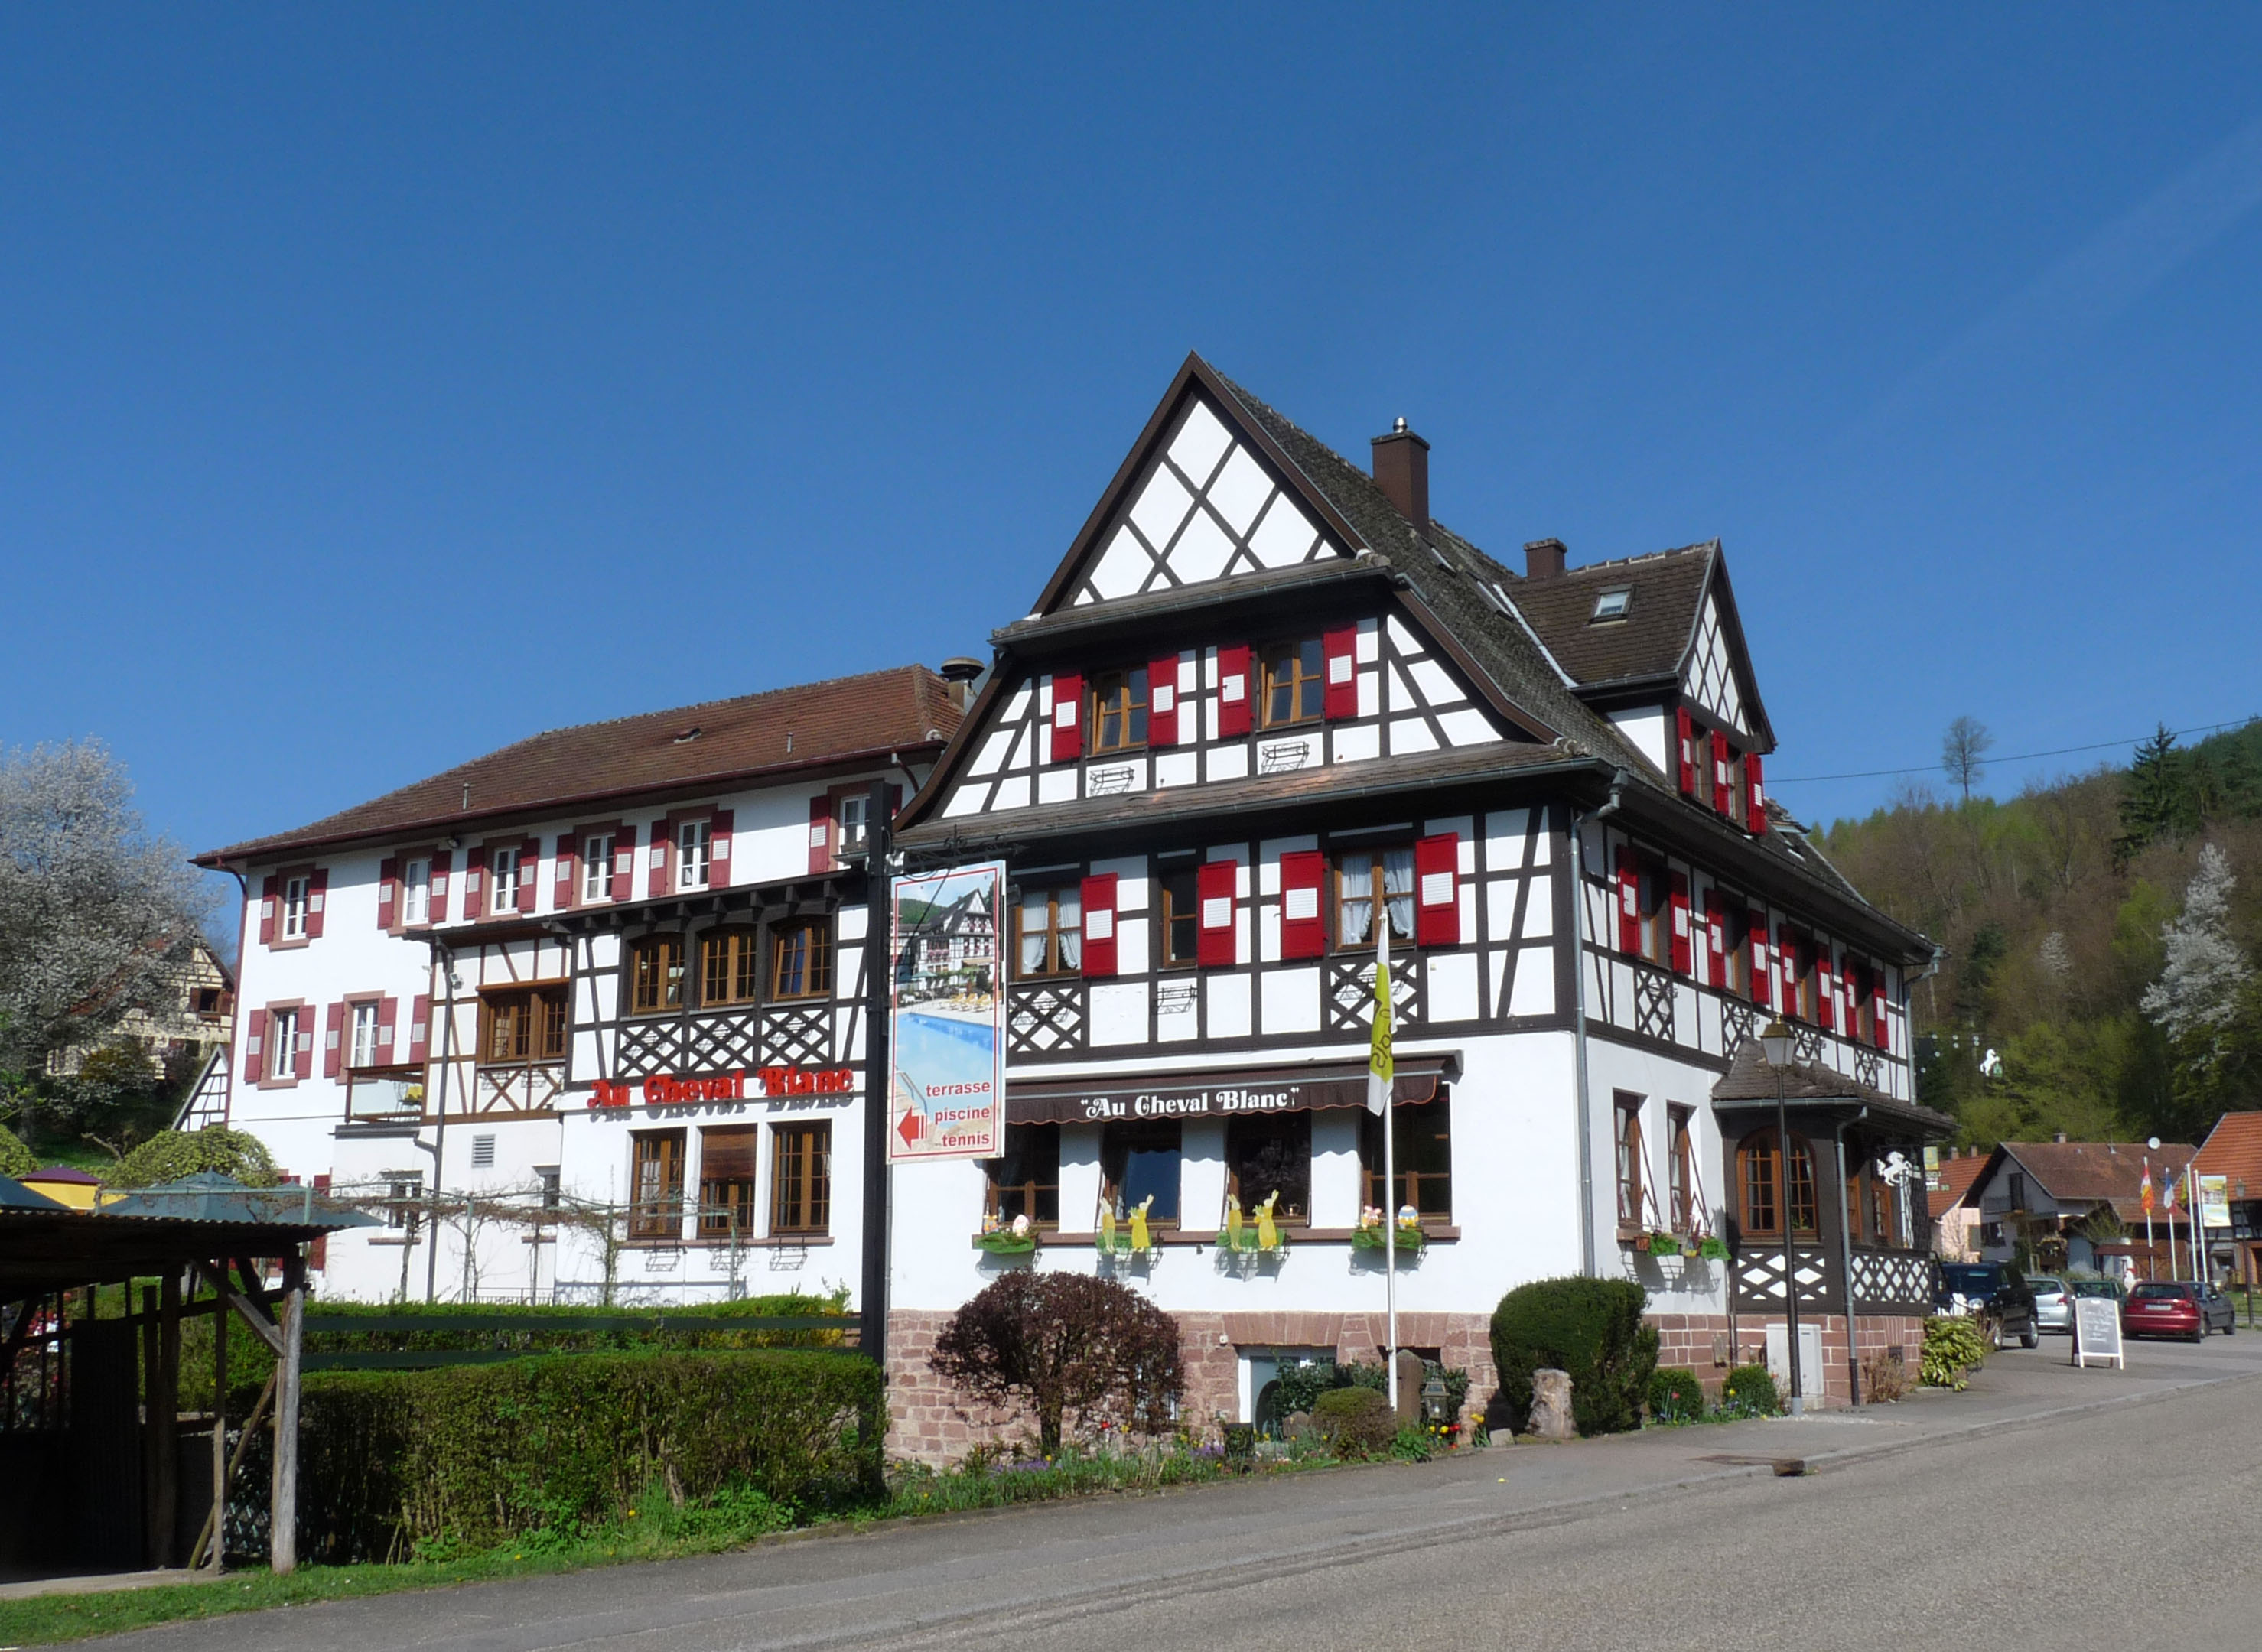 Hotel Restaurant Du Cap Gris Nez